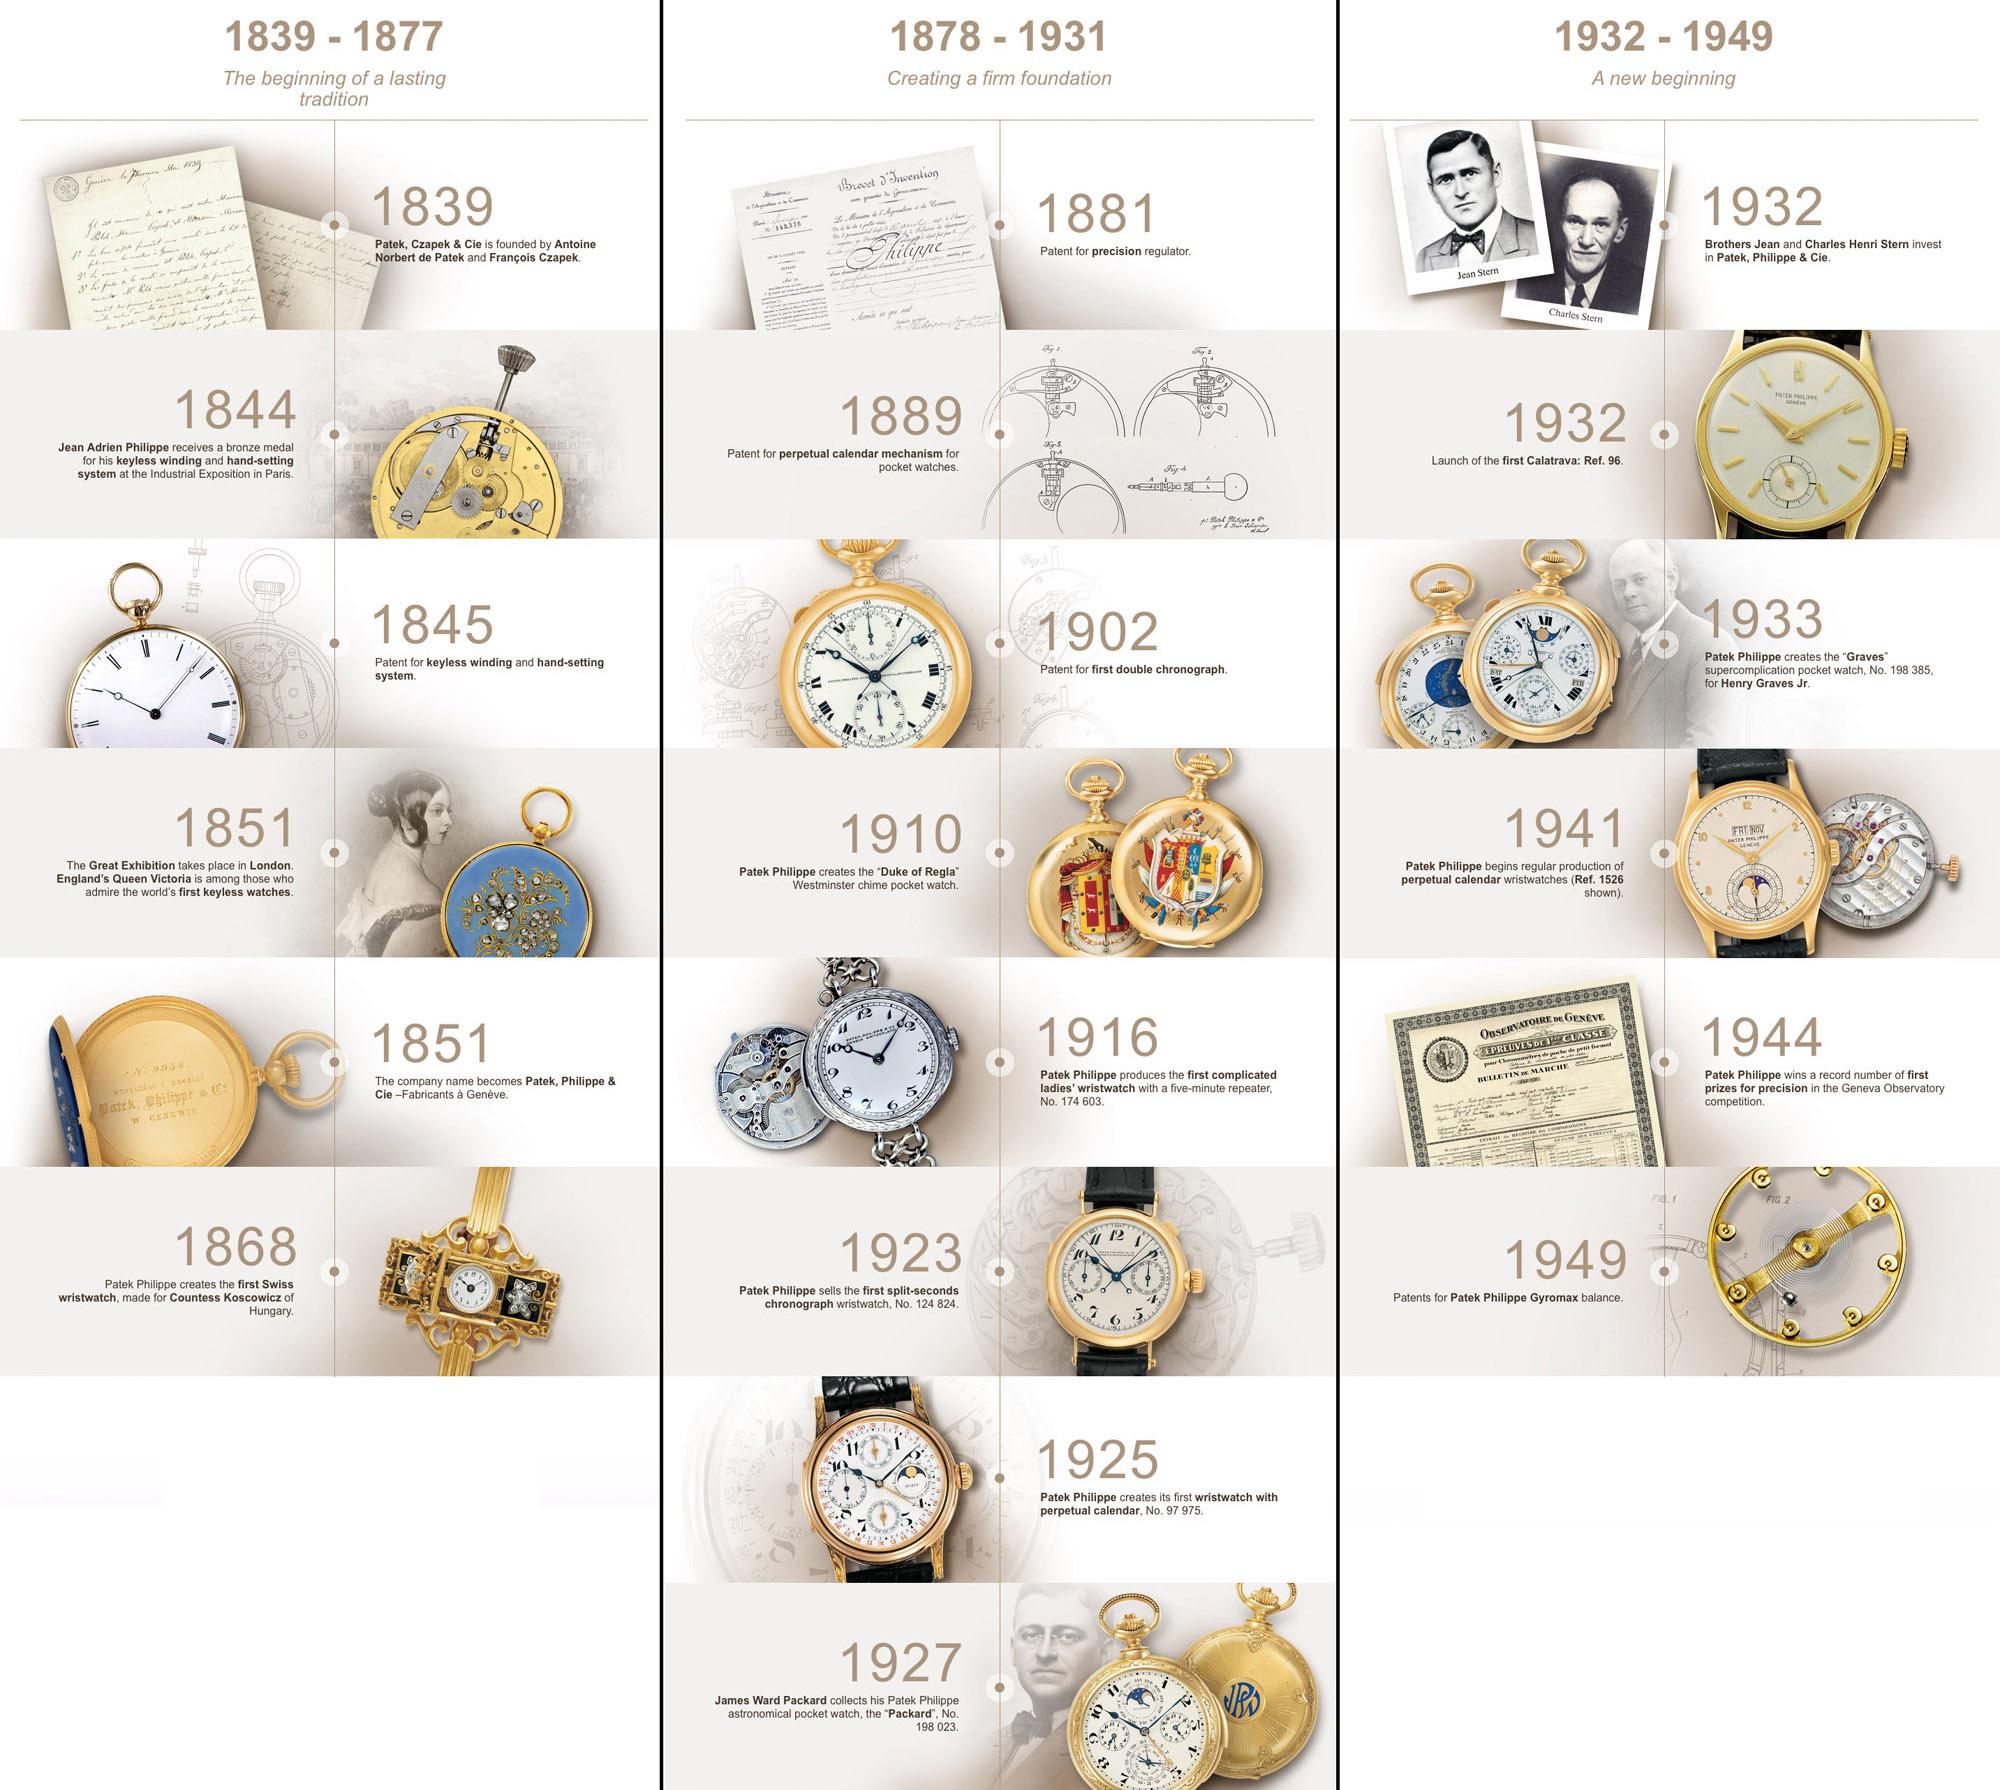 Patek Philippe History 1839 1949